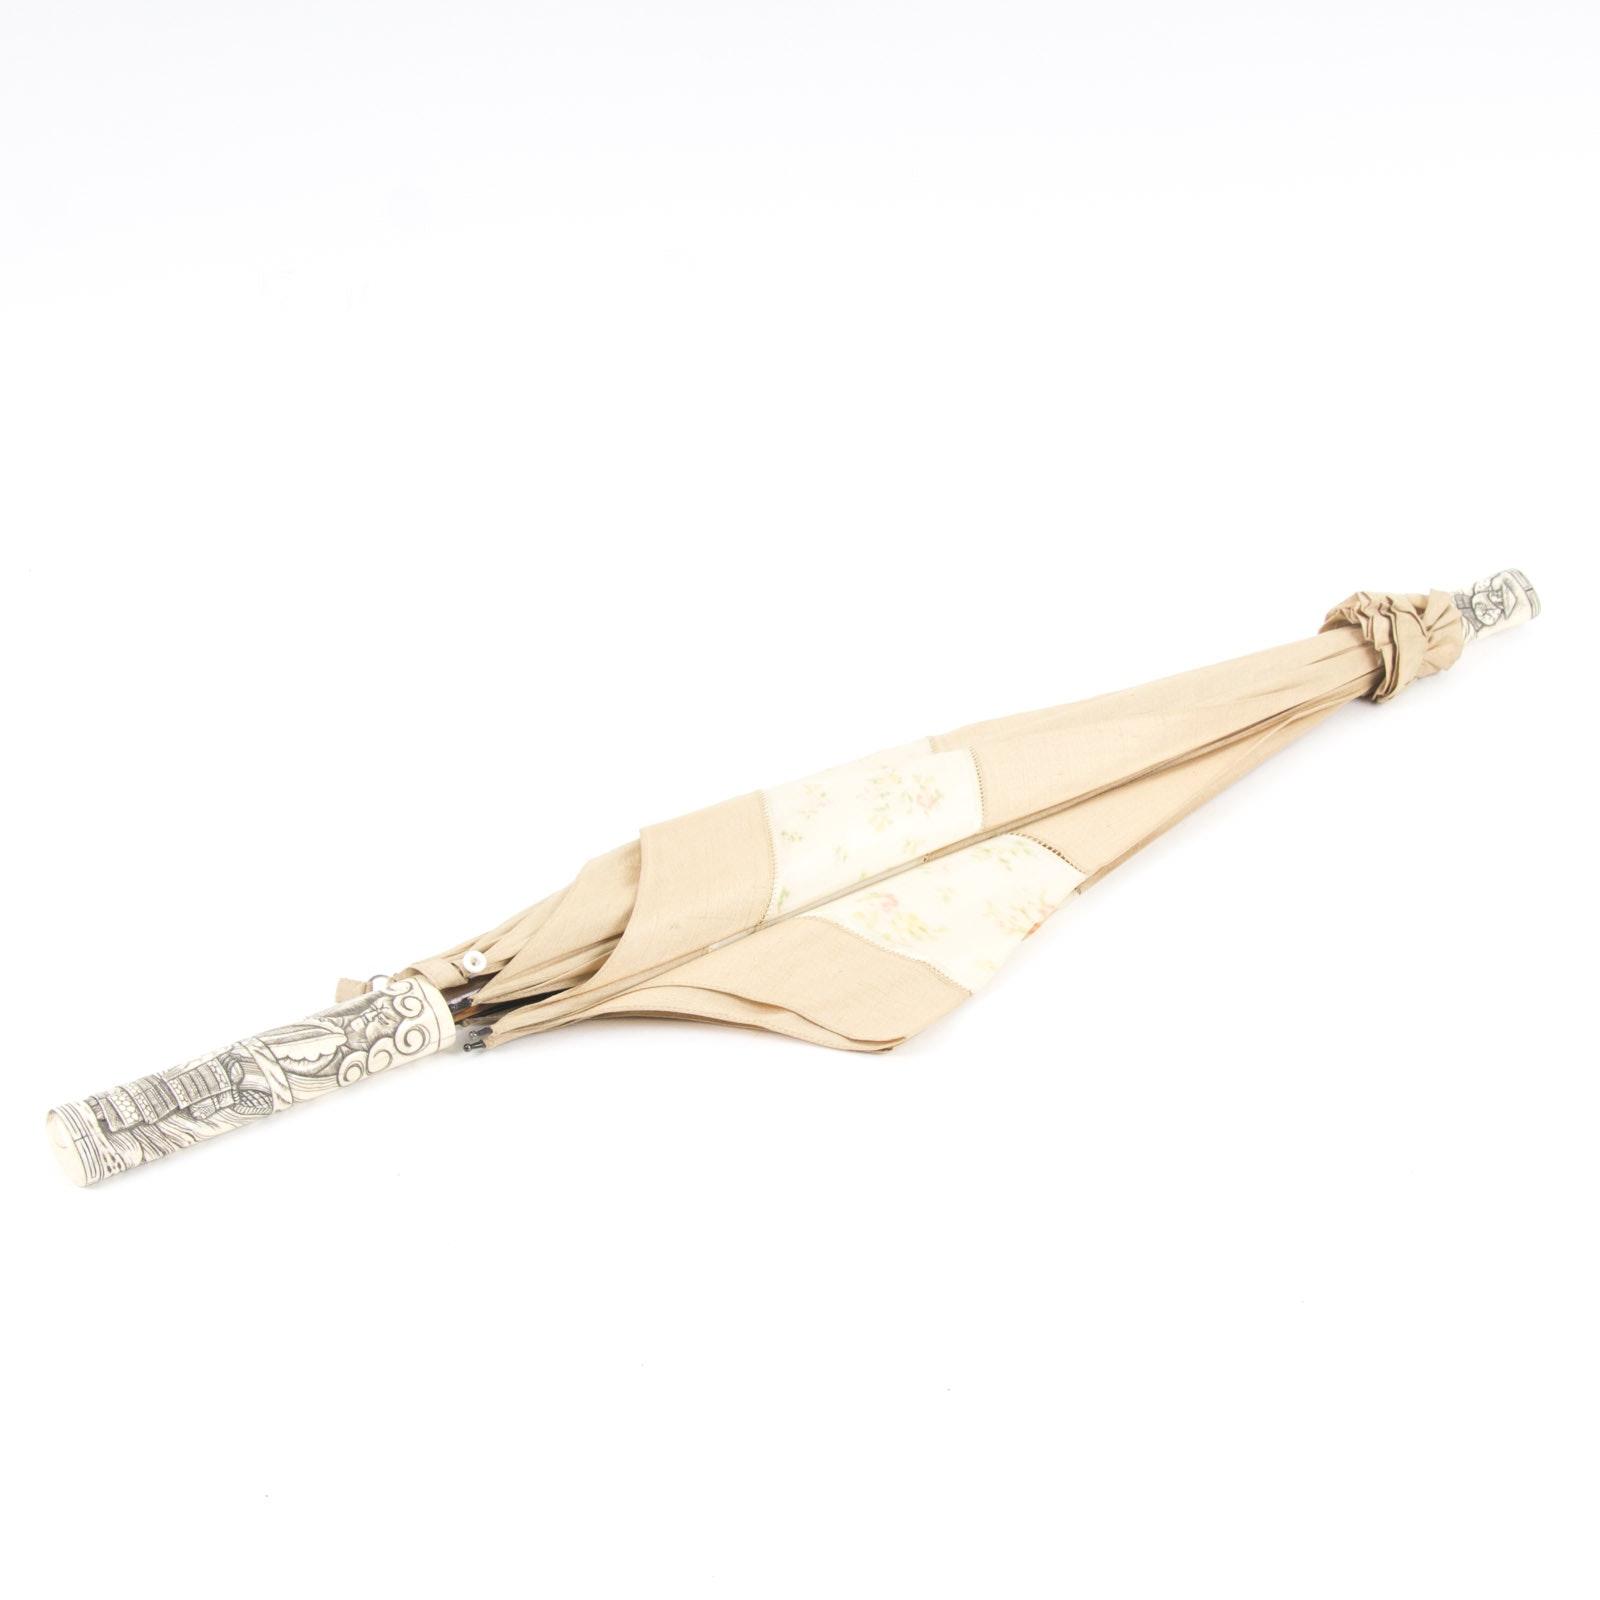 Vintage Japanese Umbrella with Carved Bone Elements